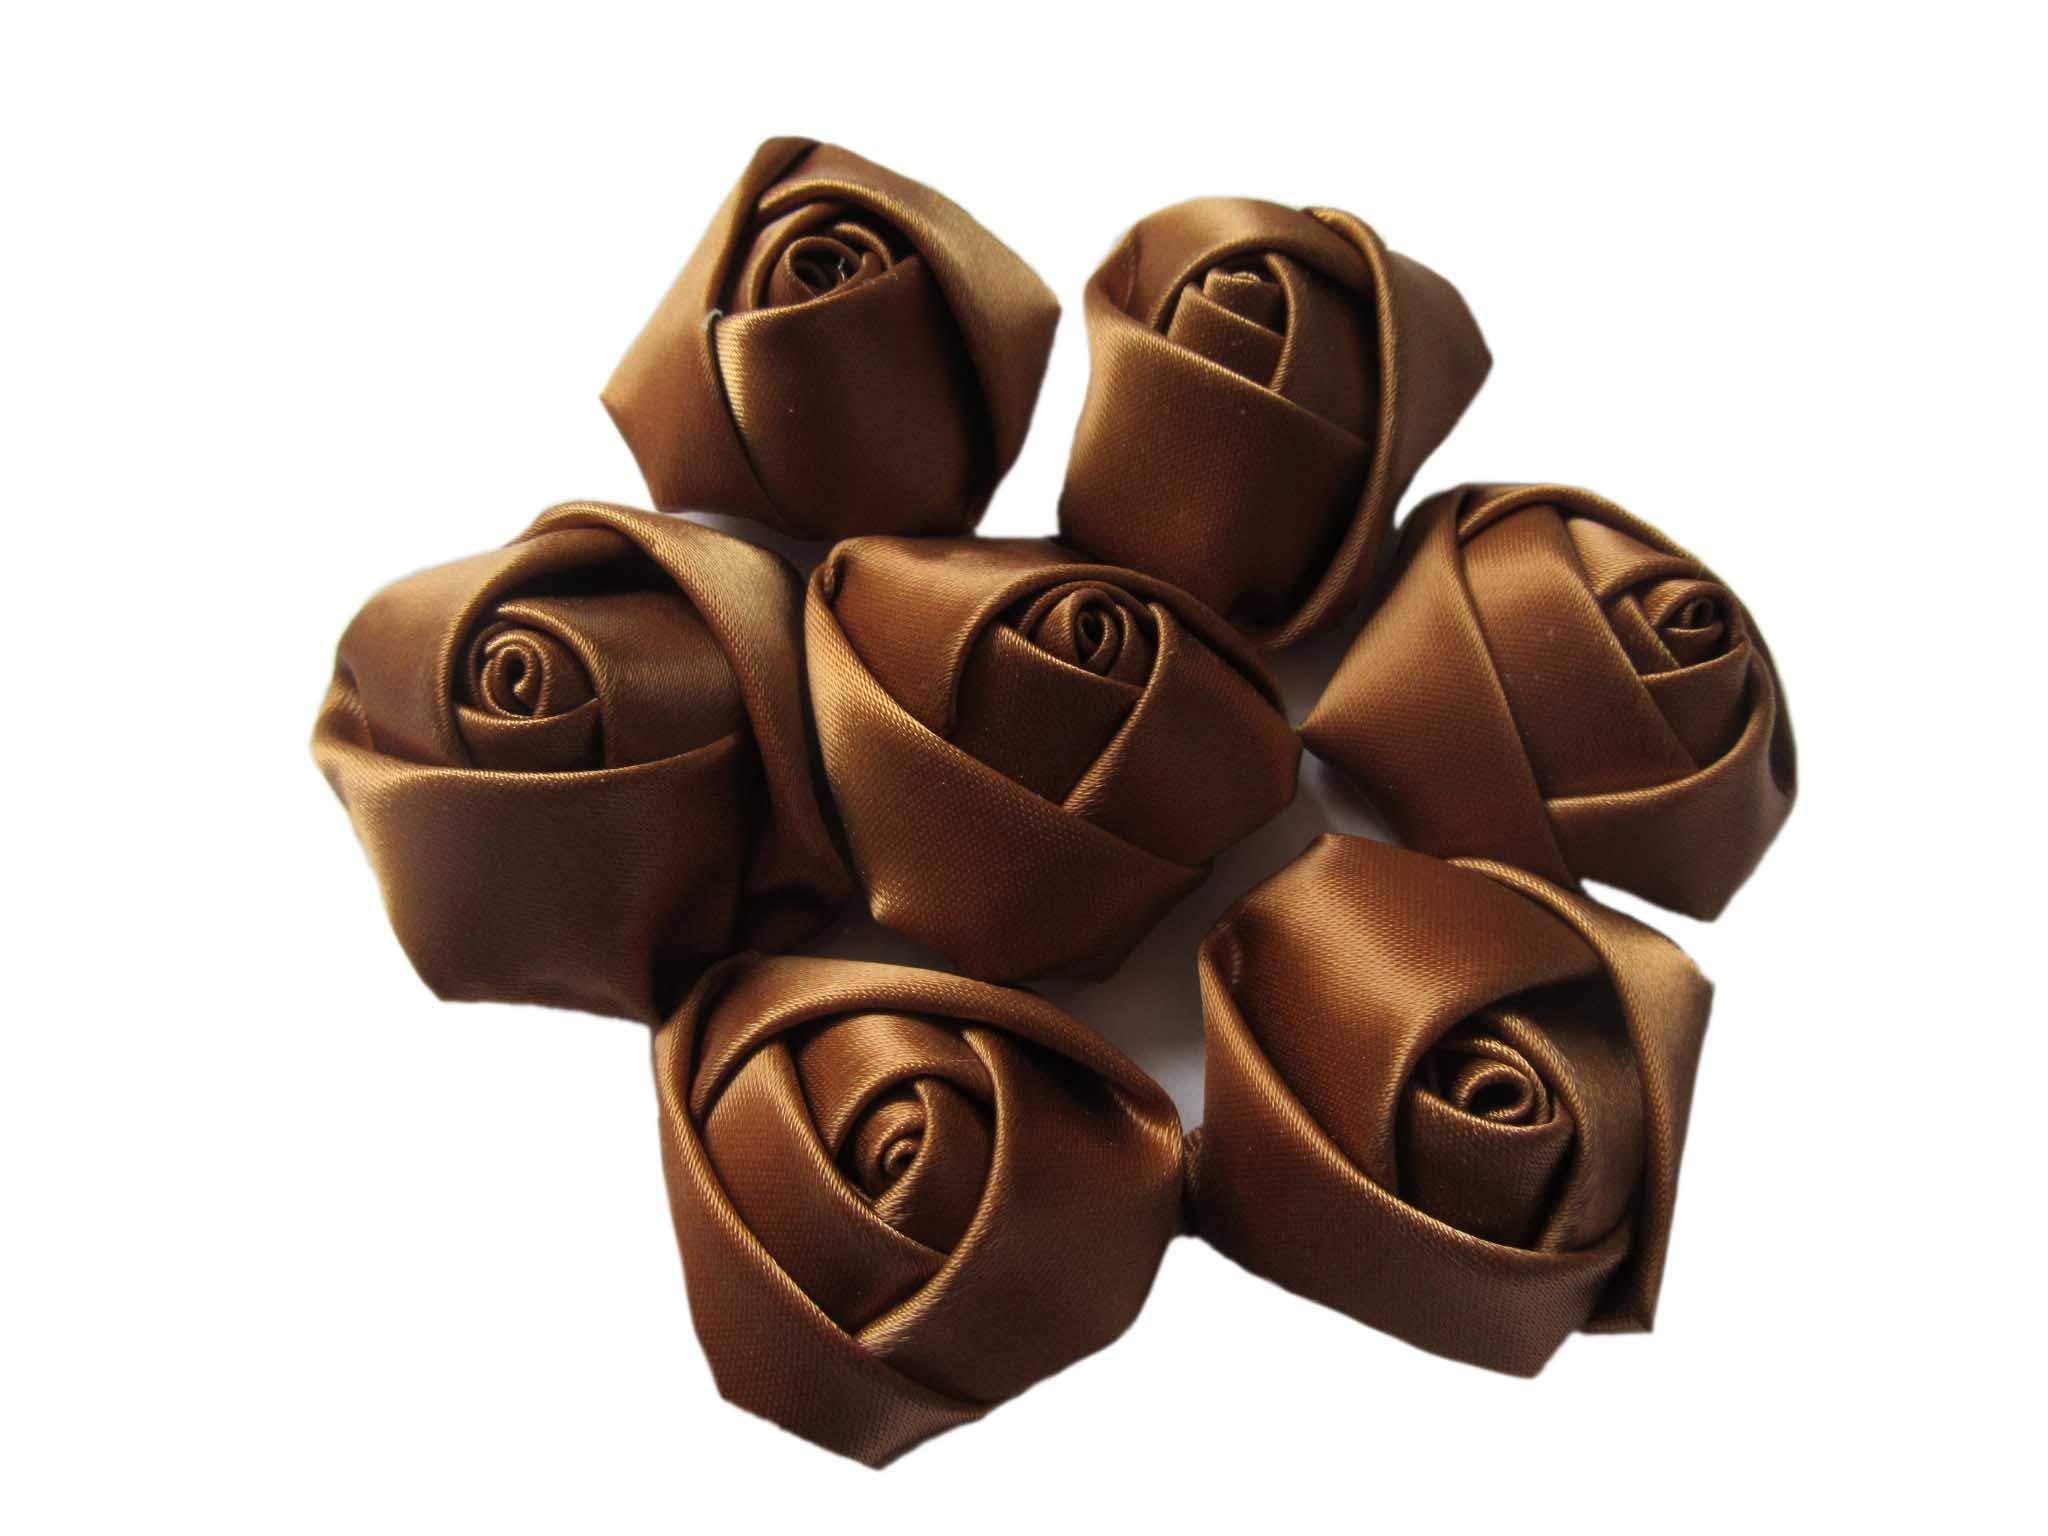 YYCRAFT-30pcs-Satin-Rose-15-Rose-Flower-for-Craft-Wedding-Bride-BouquetChocolate